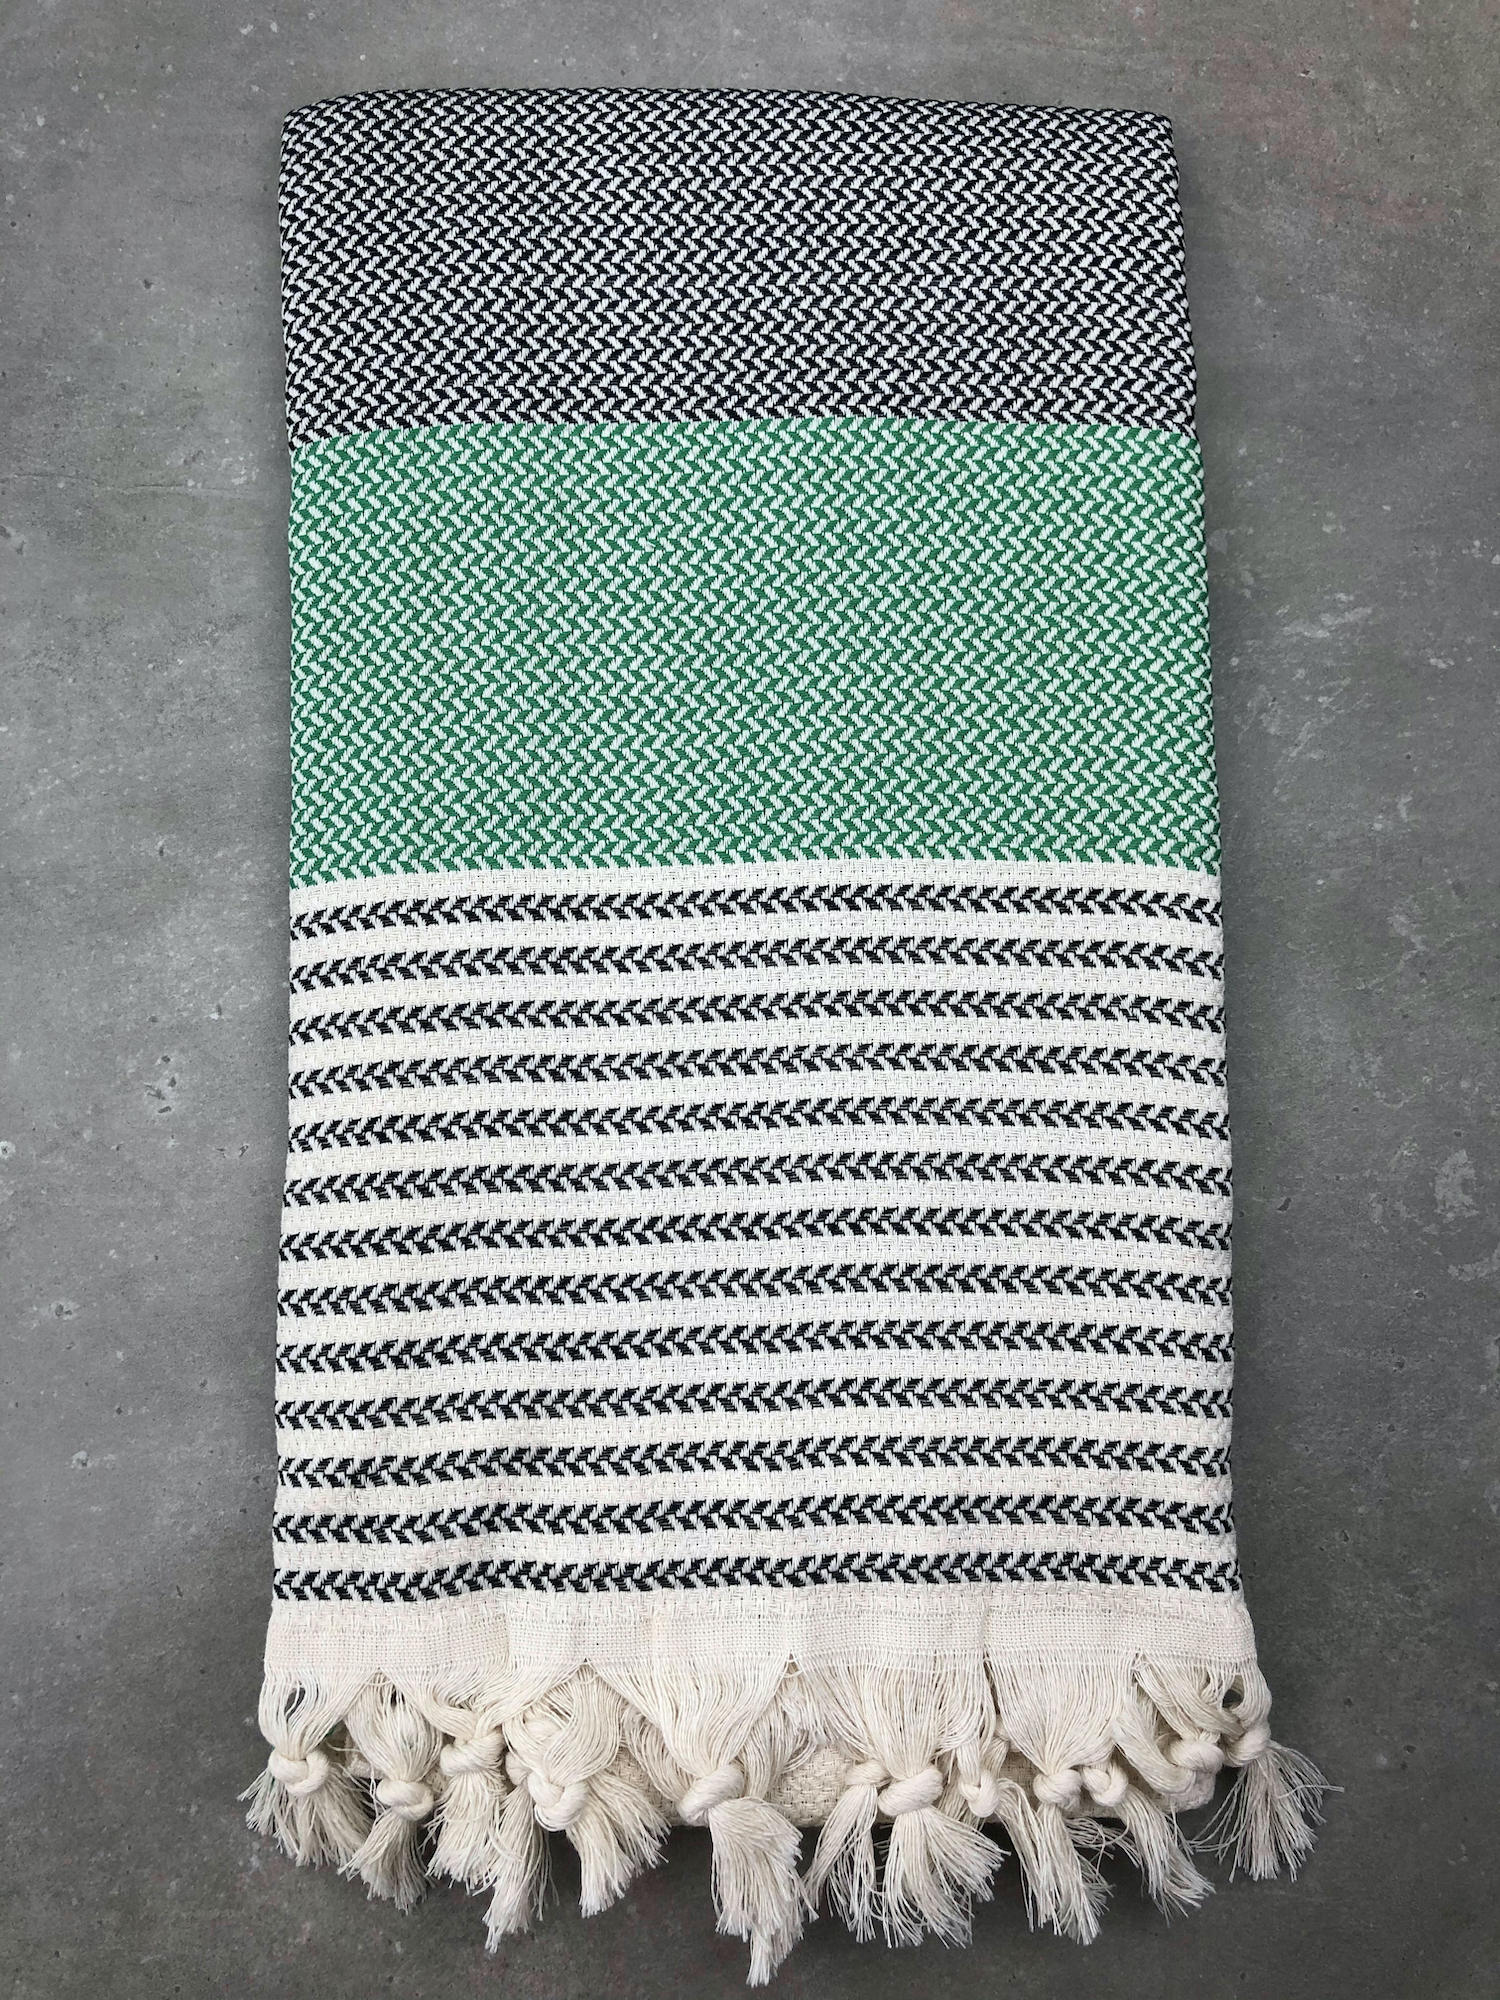 groen-sort-hammam